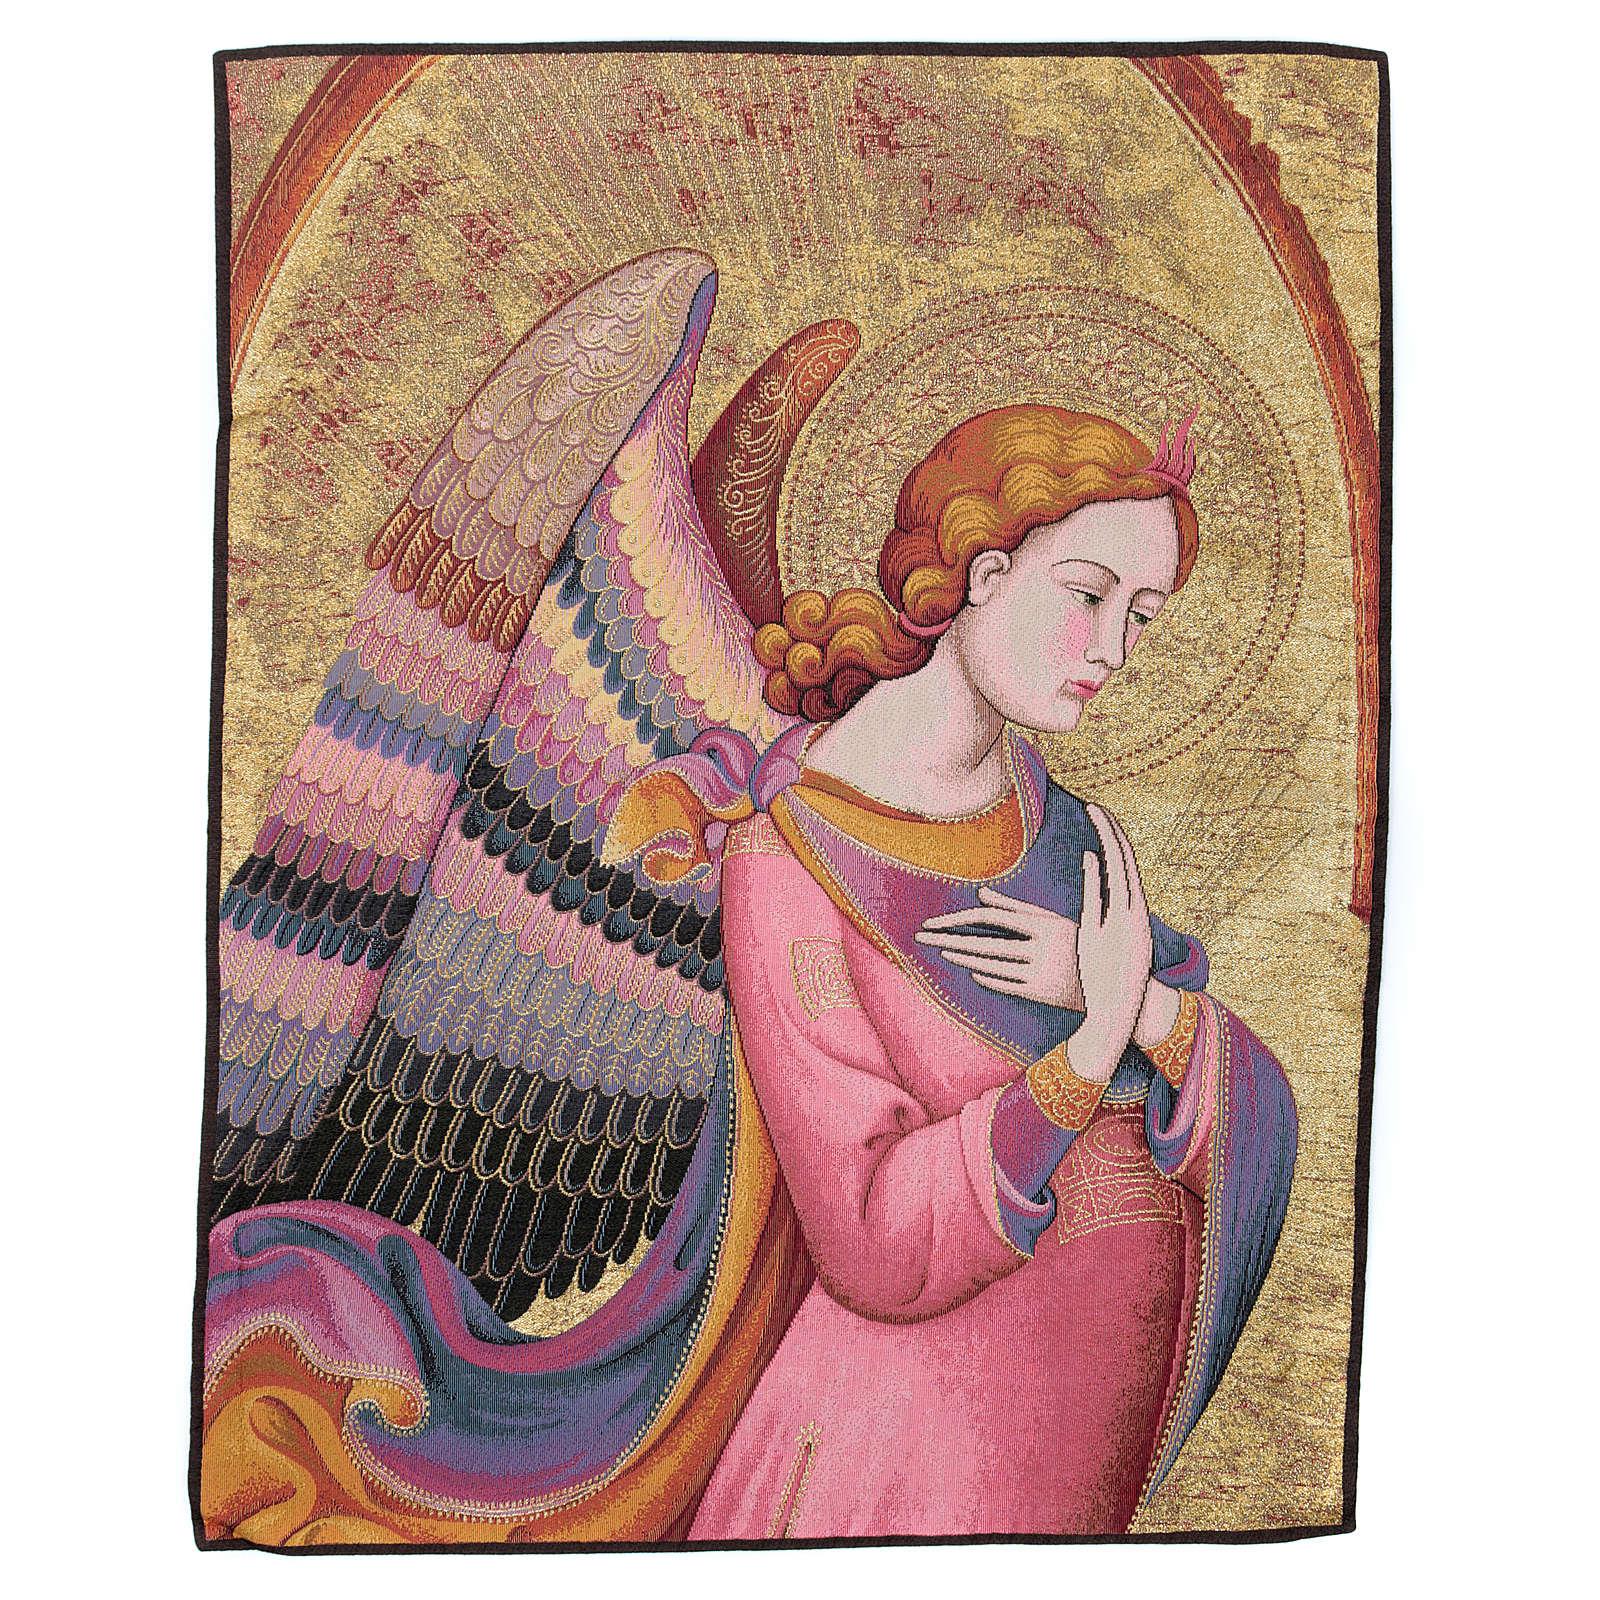 Wandteppich Engel nach Lorenzo Monaco 90x65 cm 3